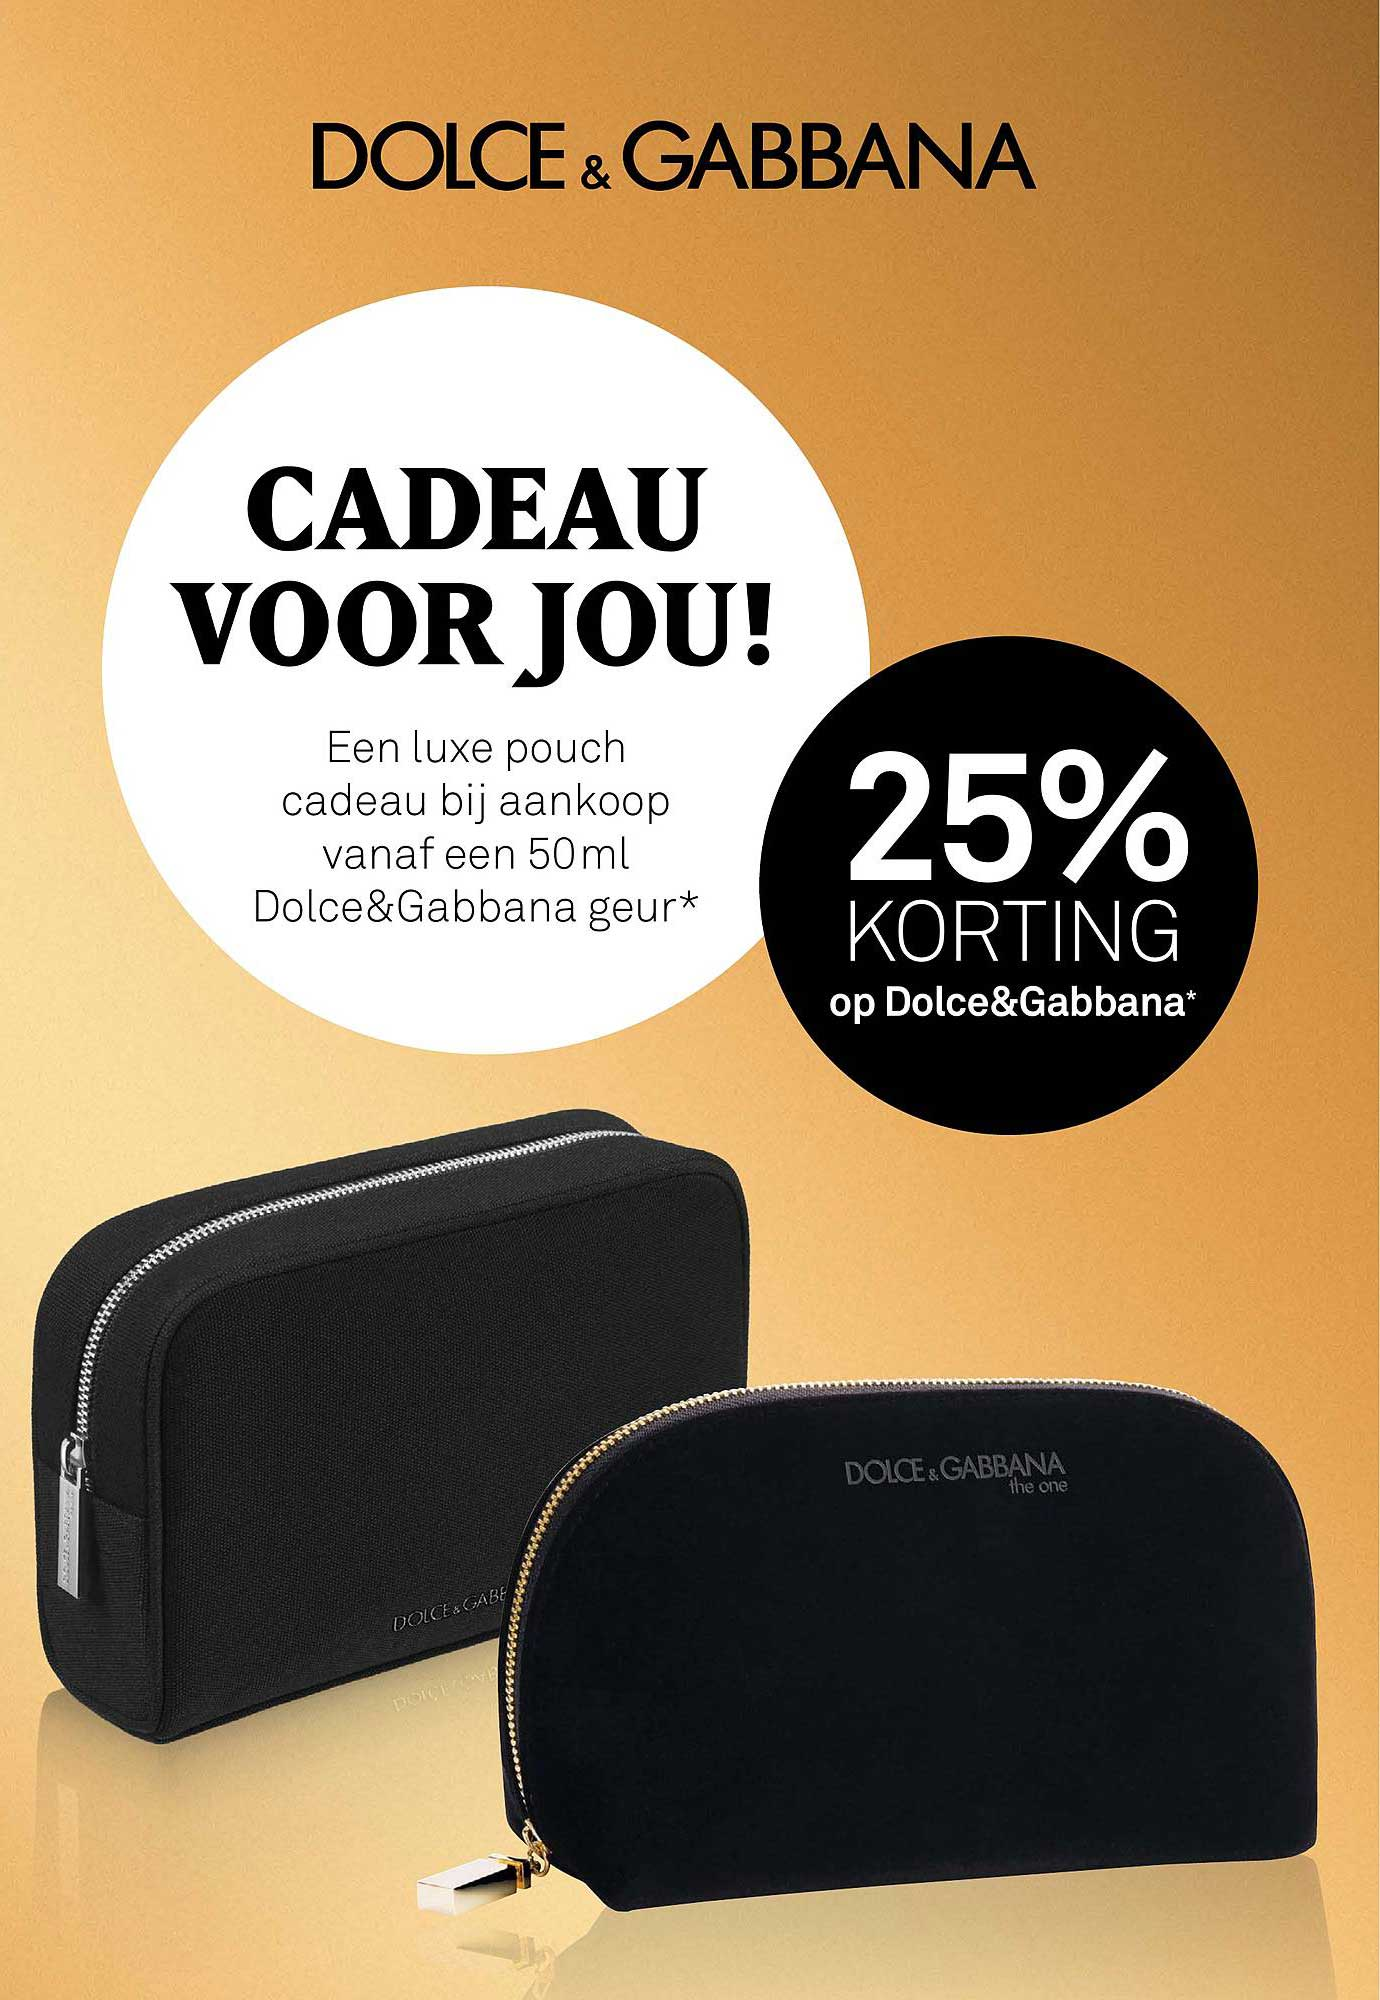 MOOI Parfumerie Op Dolce&Gabbana 25% Korting